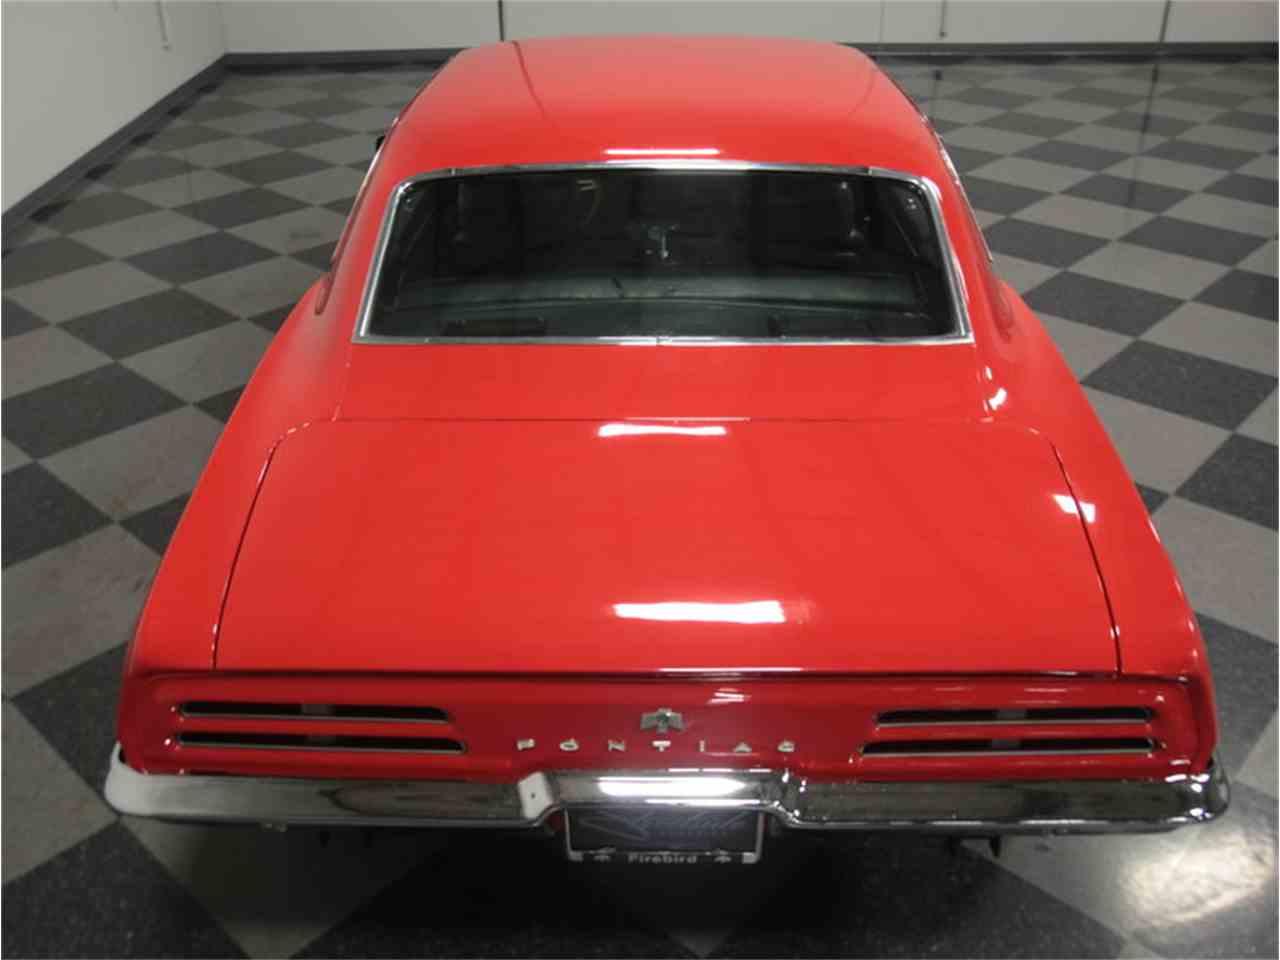 Large Picture of 1969 Pontiac Firebird located in Georgia - $27,995.00 - JQNR